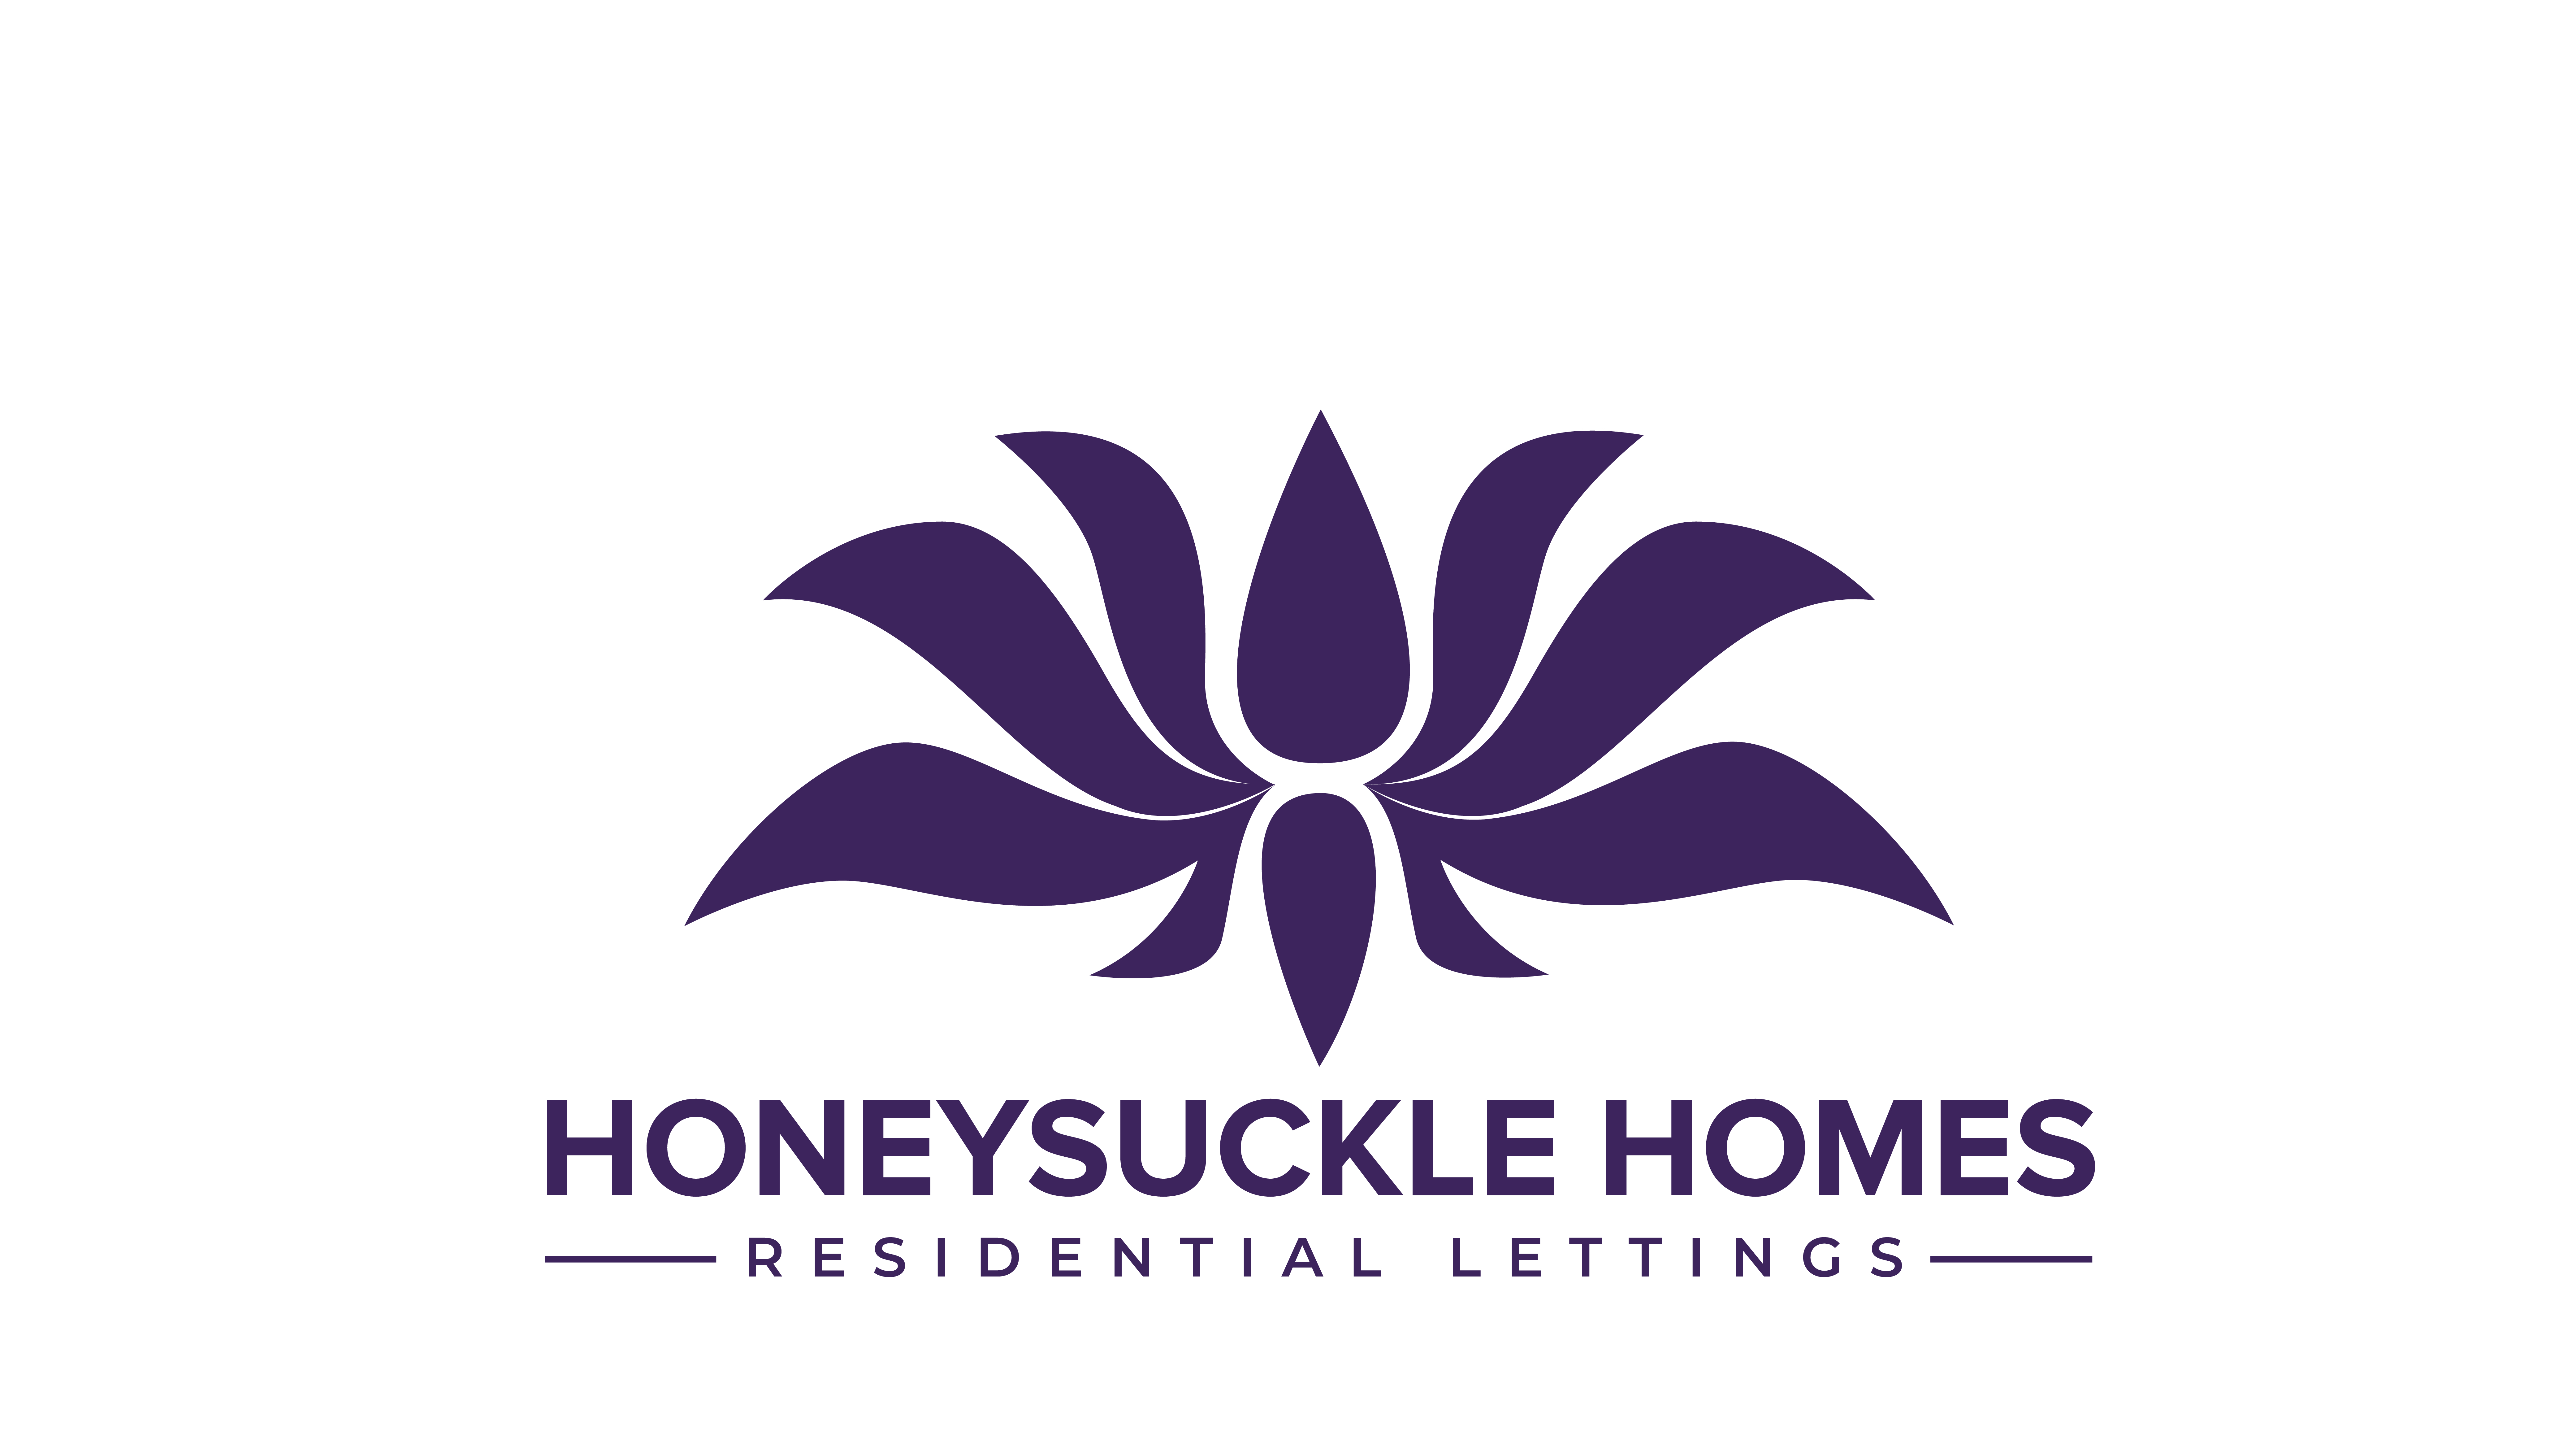 Honeysuckle Homes